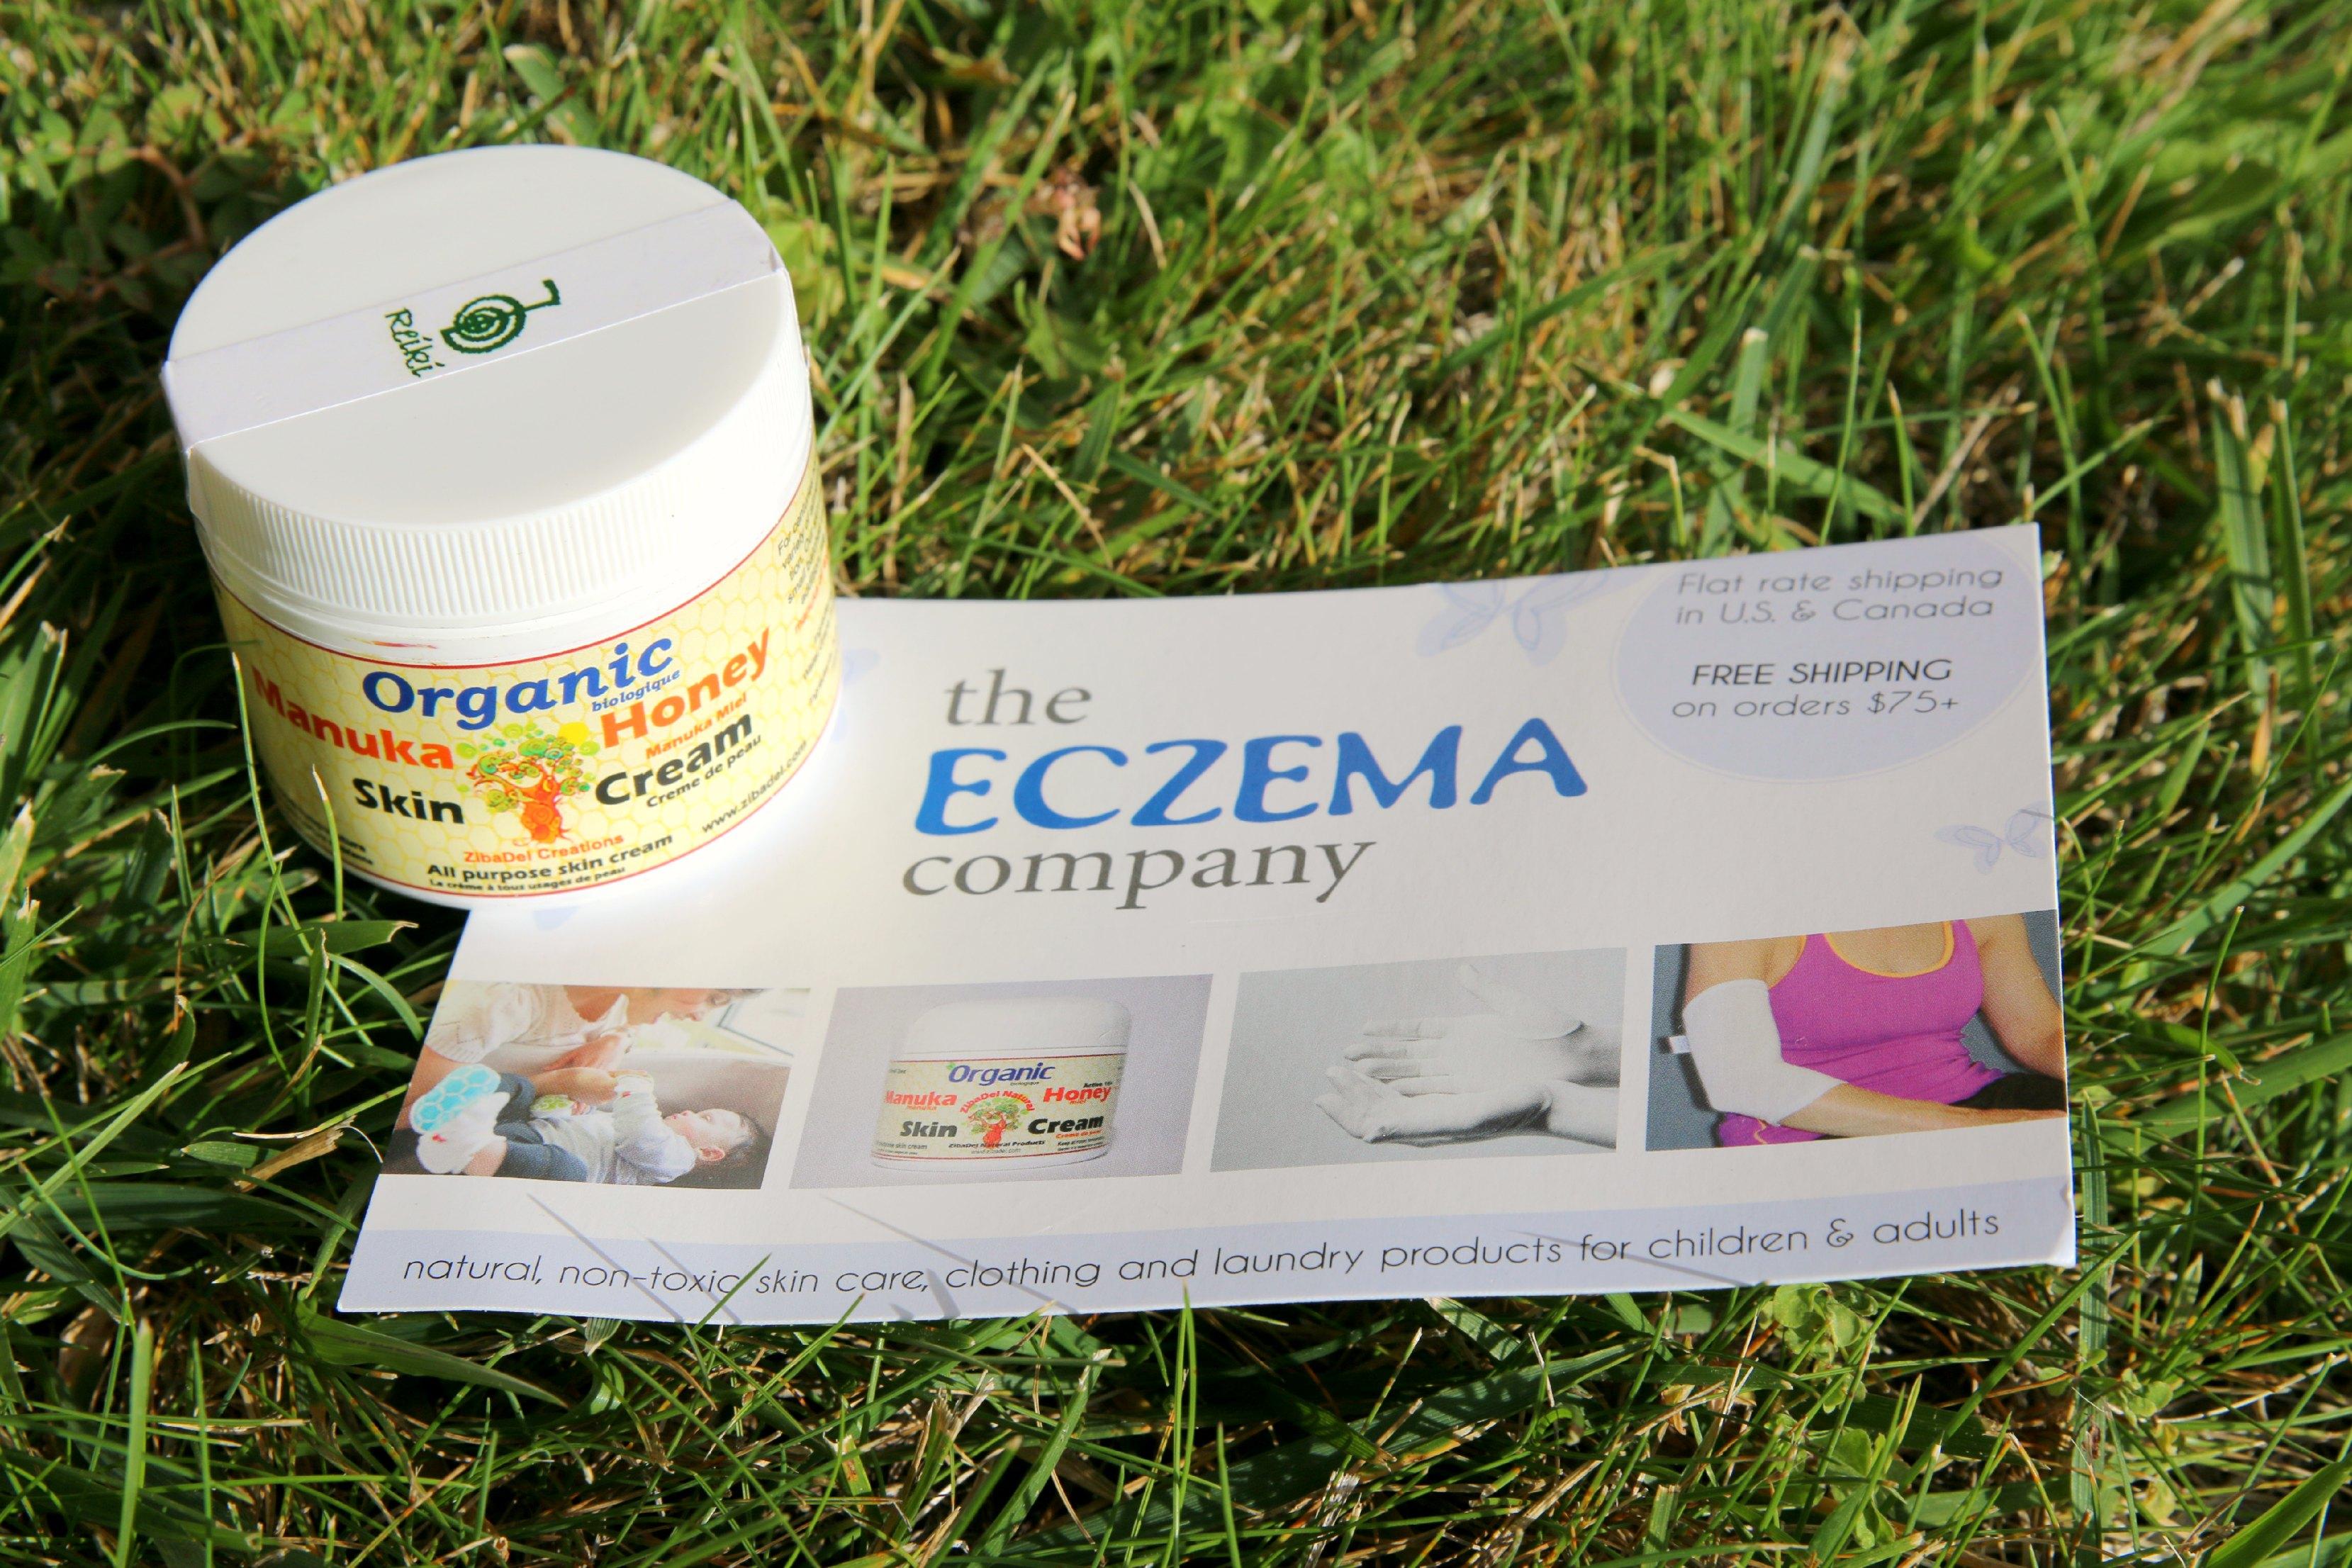 eczema company